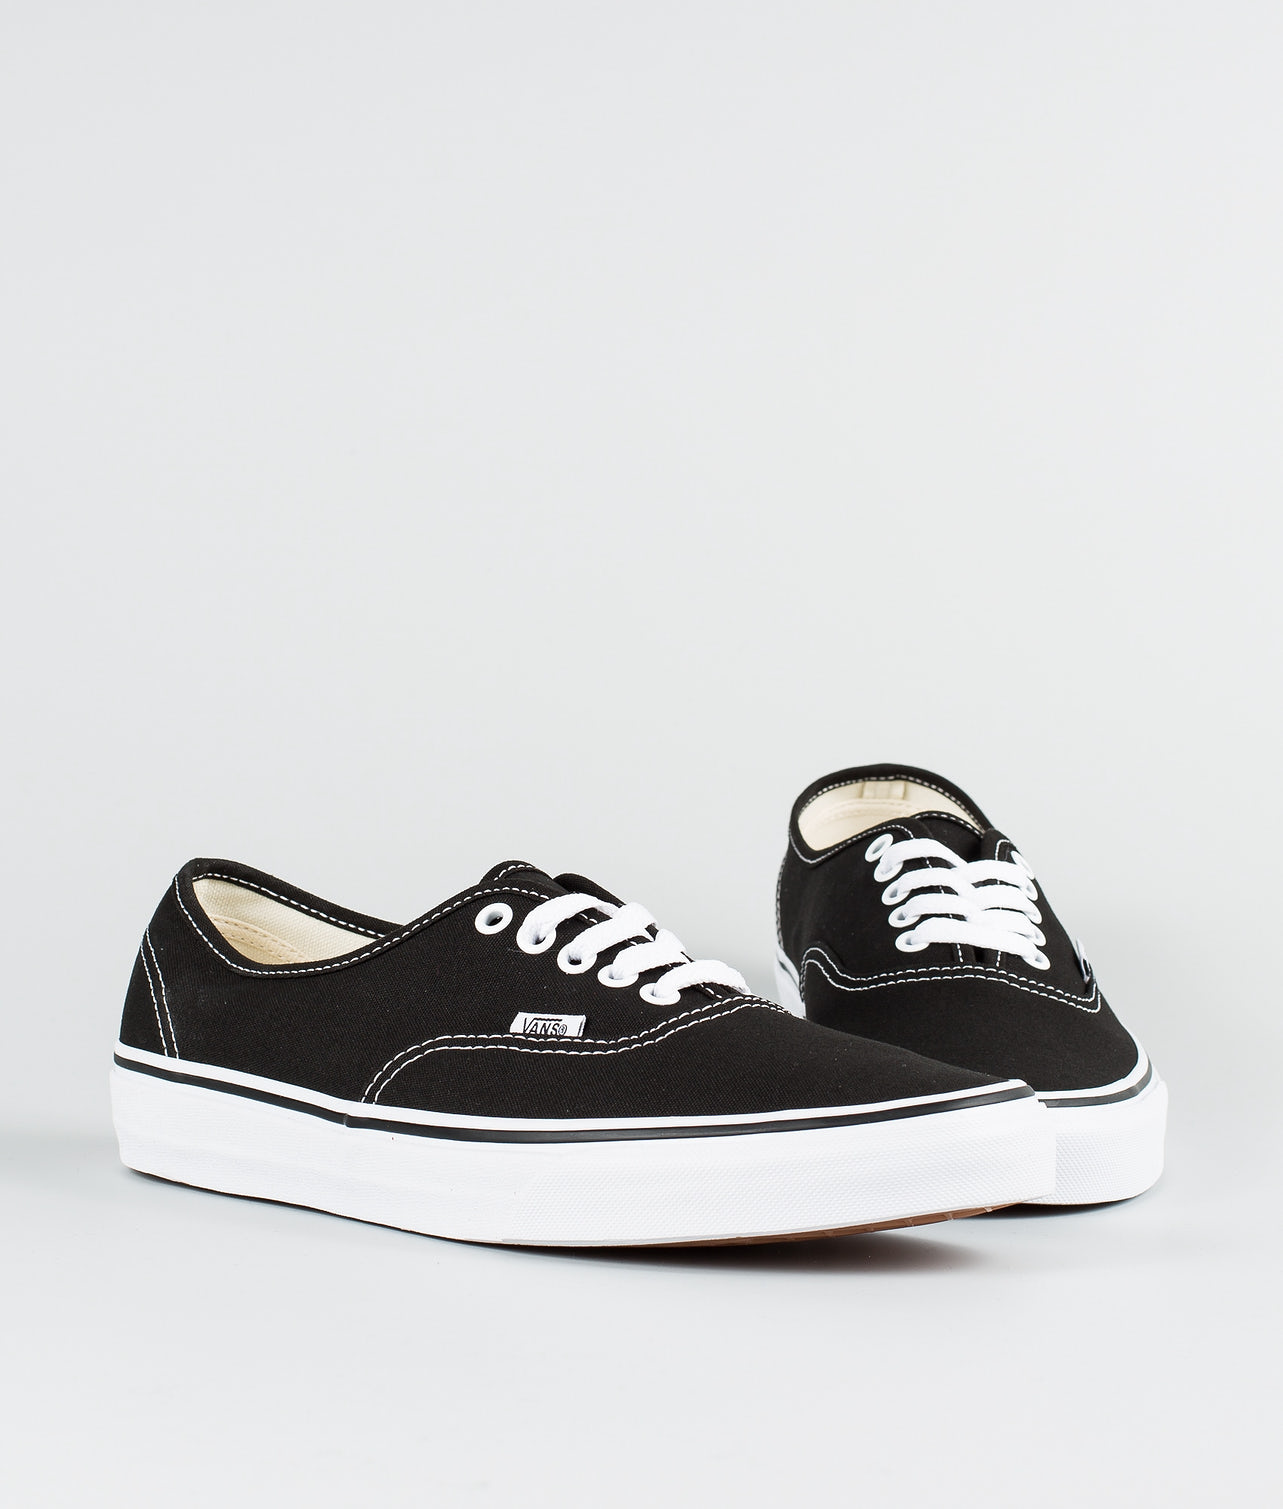 Vans Authentic Sko Black